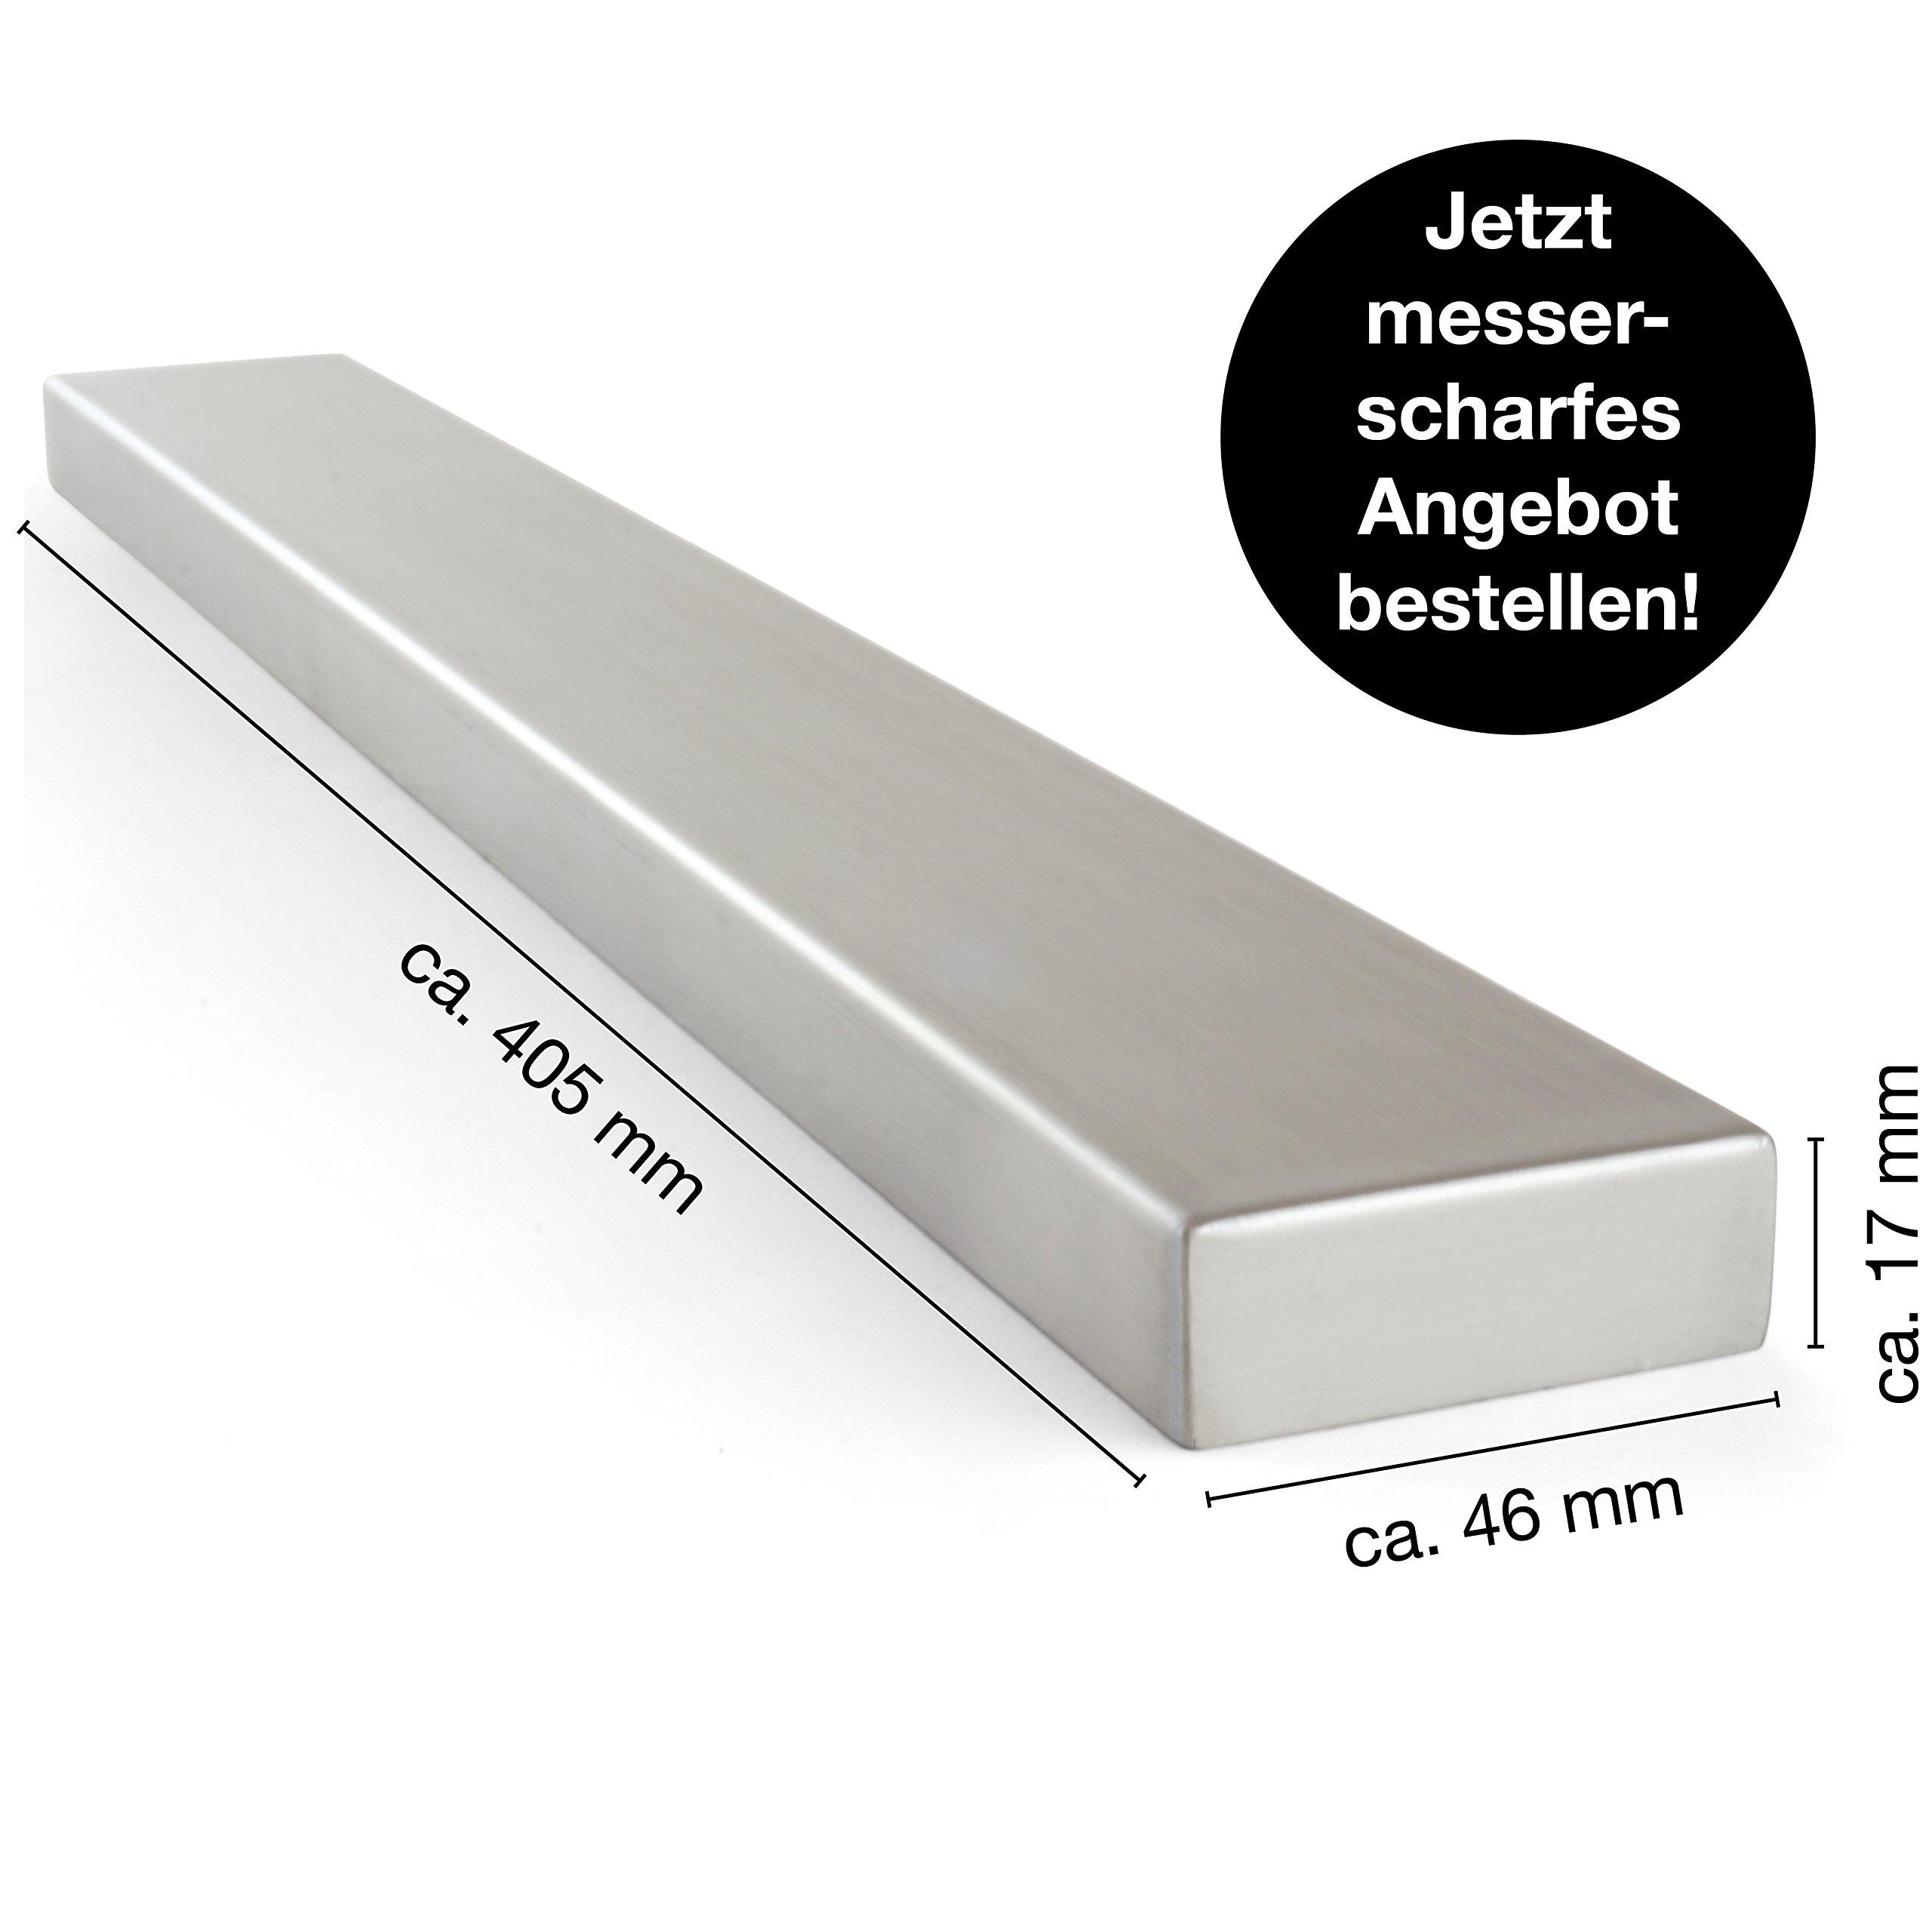 Moritz & Moritz® Barra magnetica para Cuchillos, Universal, Acero Inoxidable, 40 cm, Herramientas de Cocina para Guardar Cuchillos